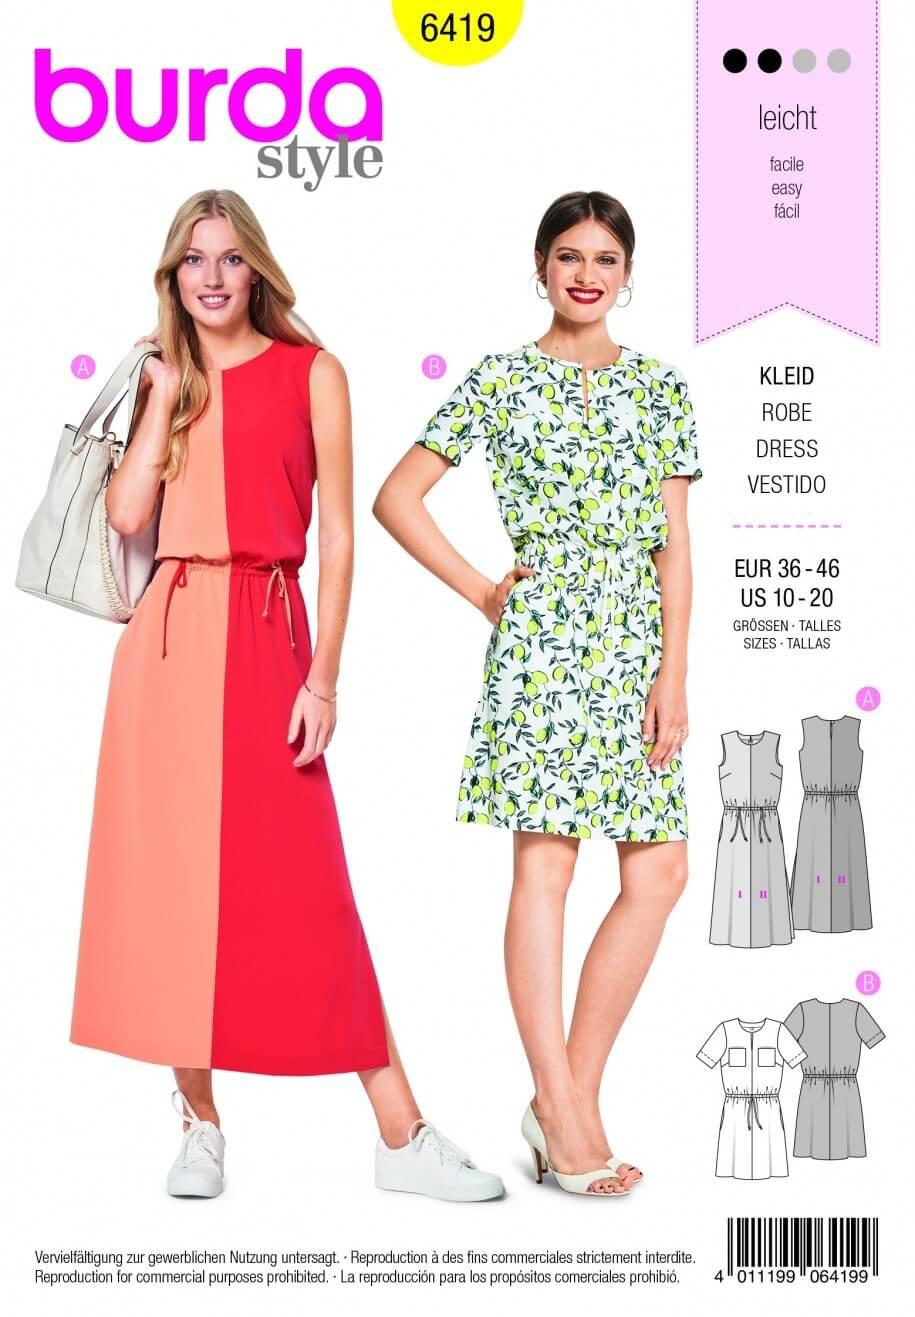 Burda Style Loose Drape Feminine Dress Fabric Sewing Pattern 6419